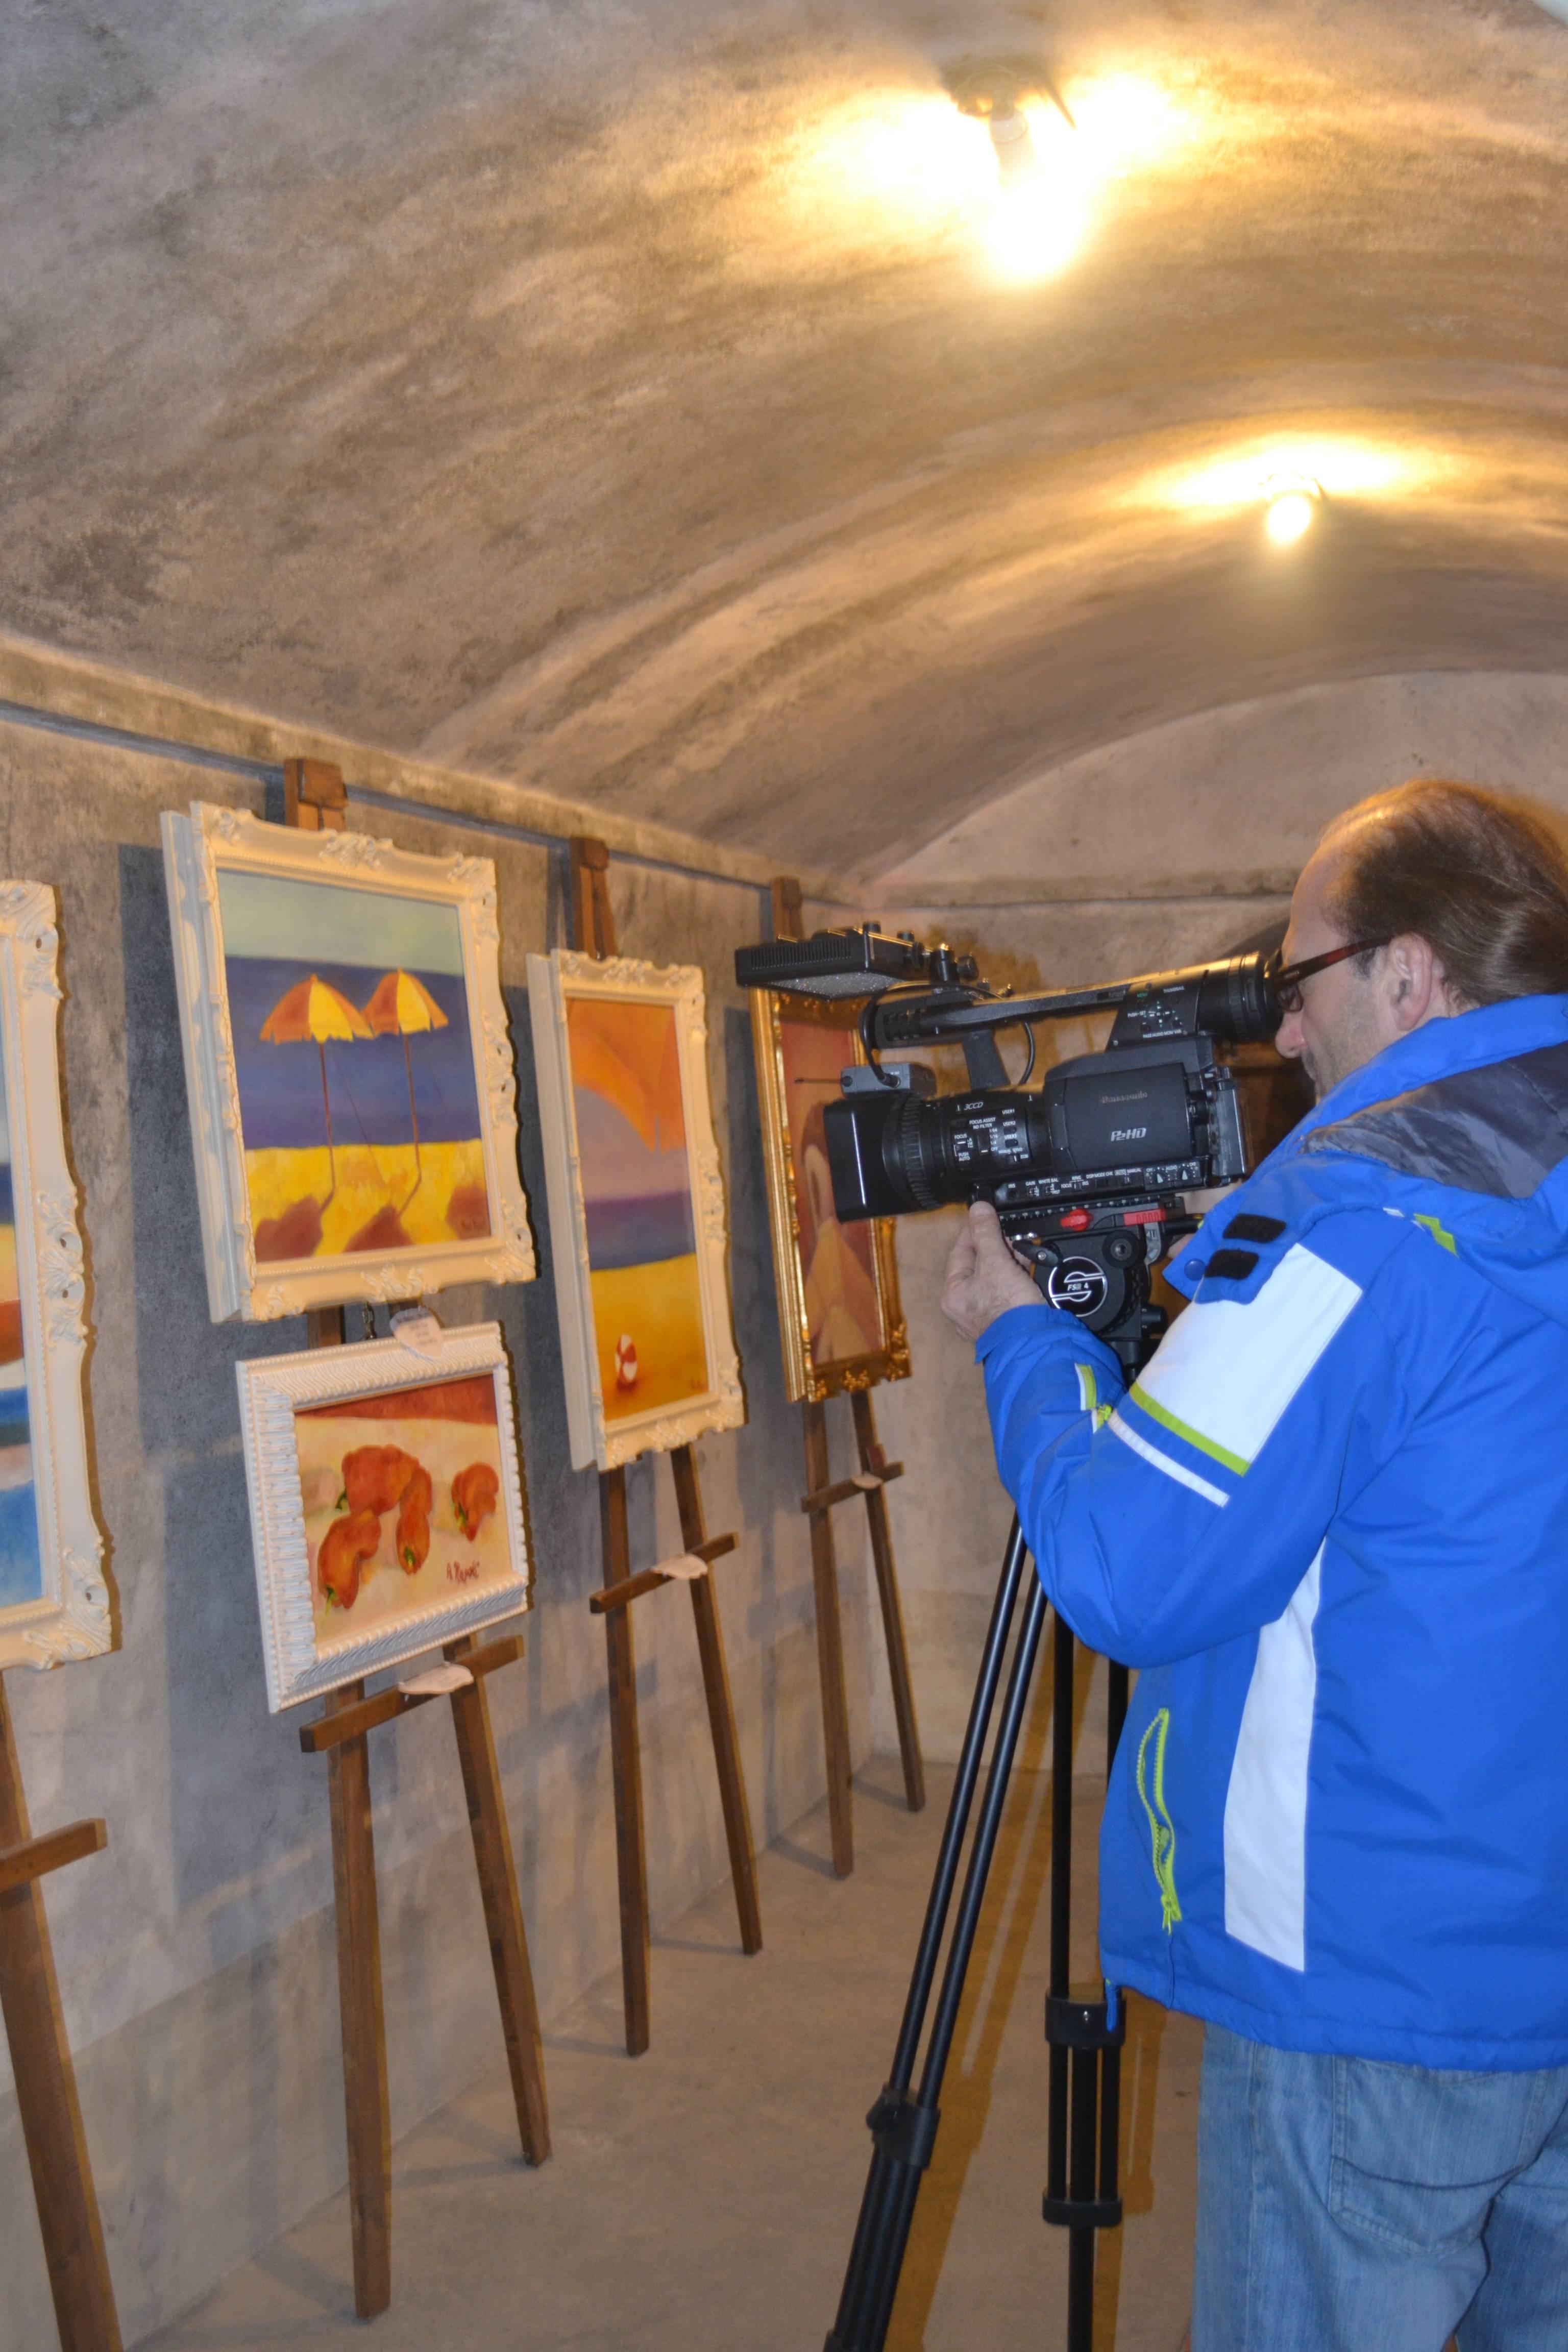 Cameramen TV Toscana Cantine Verdi Villa Medicea 2014